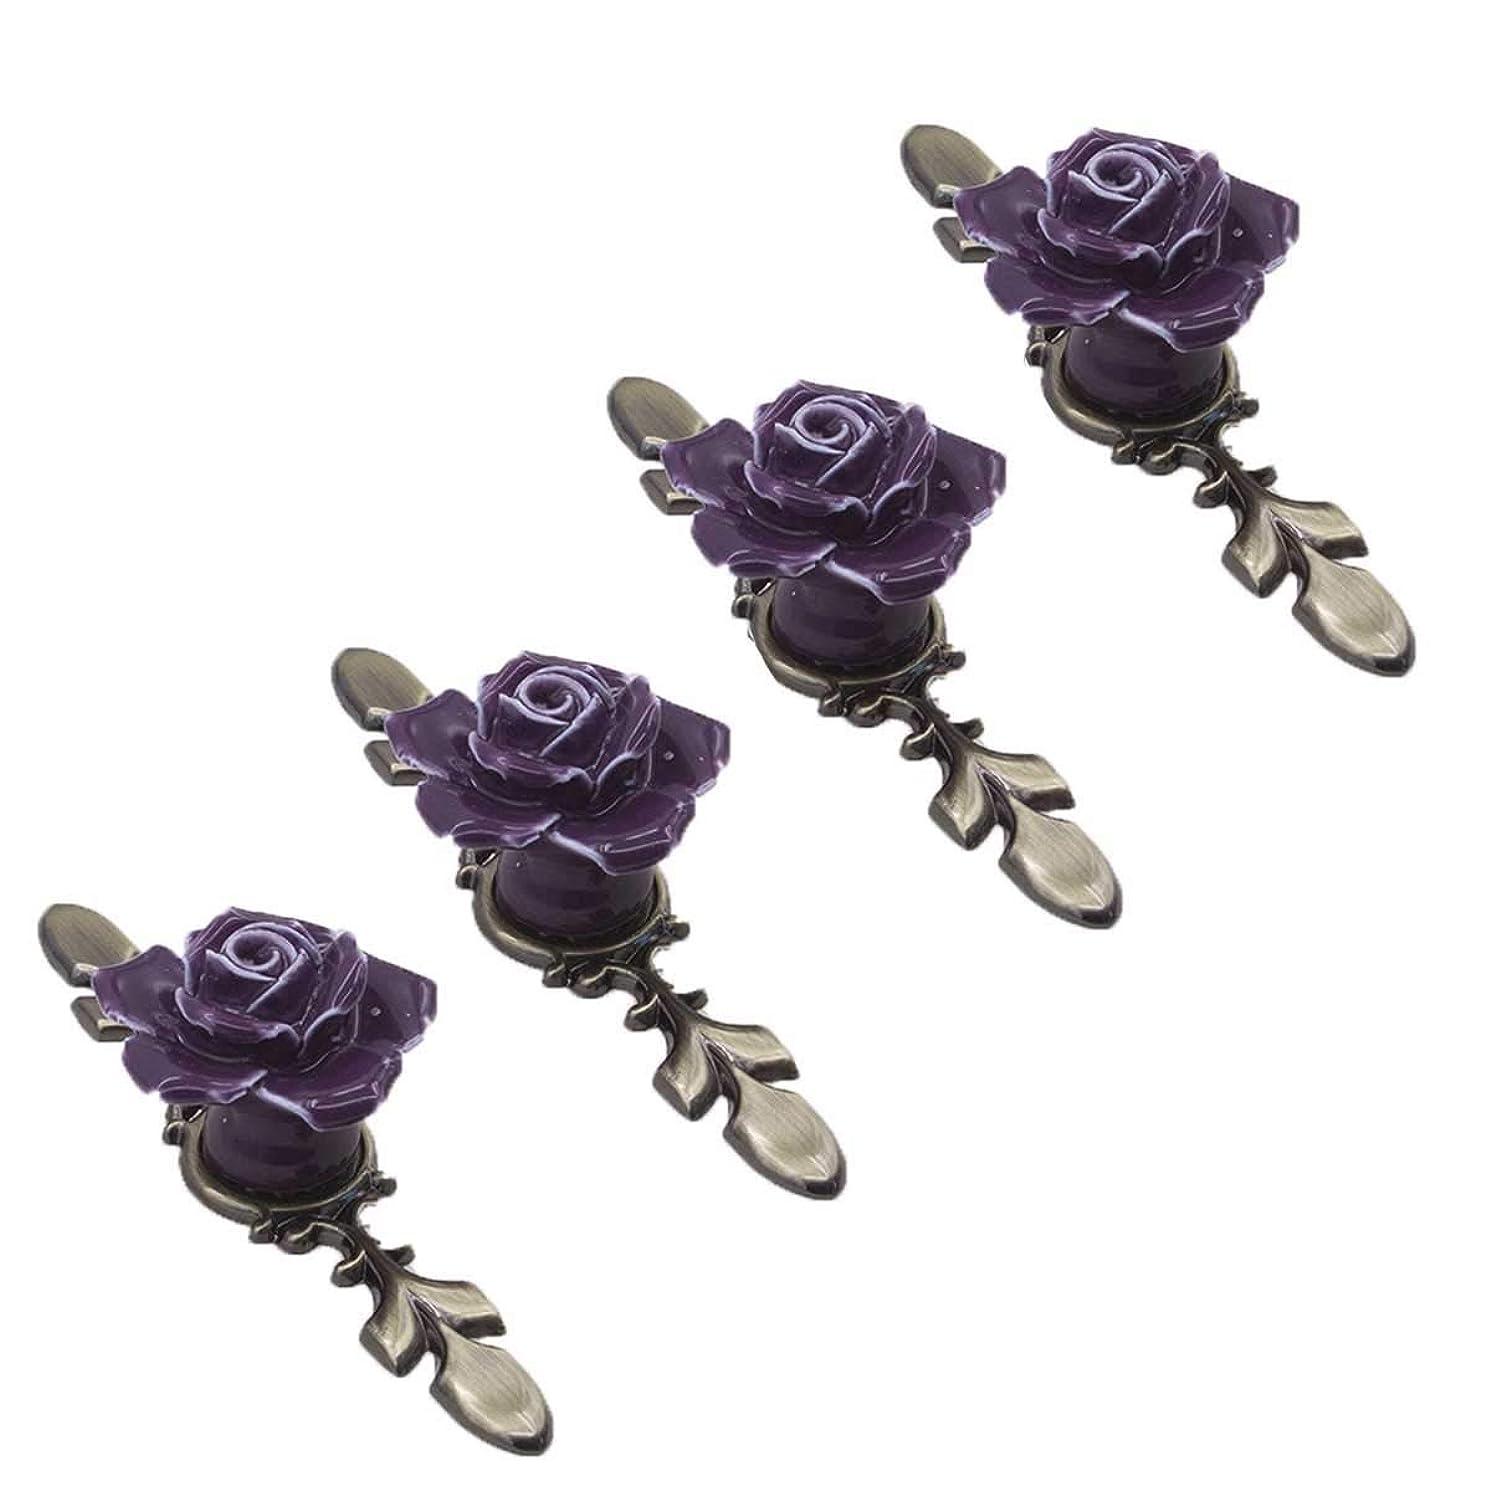 SCTD Rose Ceramic Flower Cabinet Knobs with Bronze Backplate, Vintage Kitchen Drawer Pull Handles for Dresser Cupboard Waredobe with 3 Size Screws, 4 Pack (Purple Set of 4)